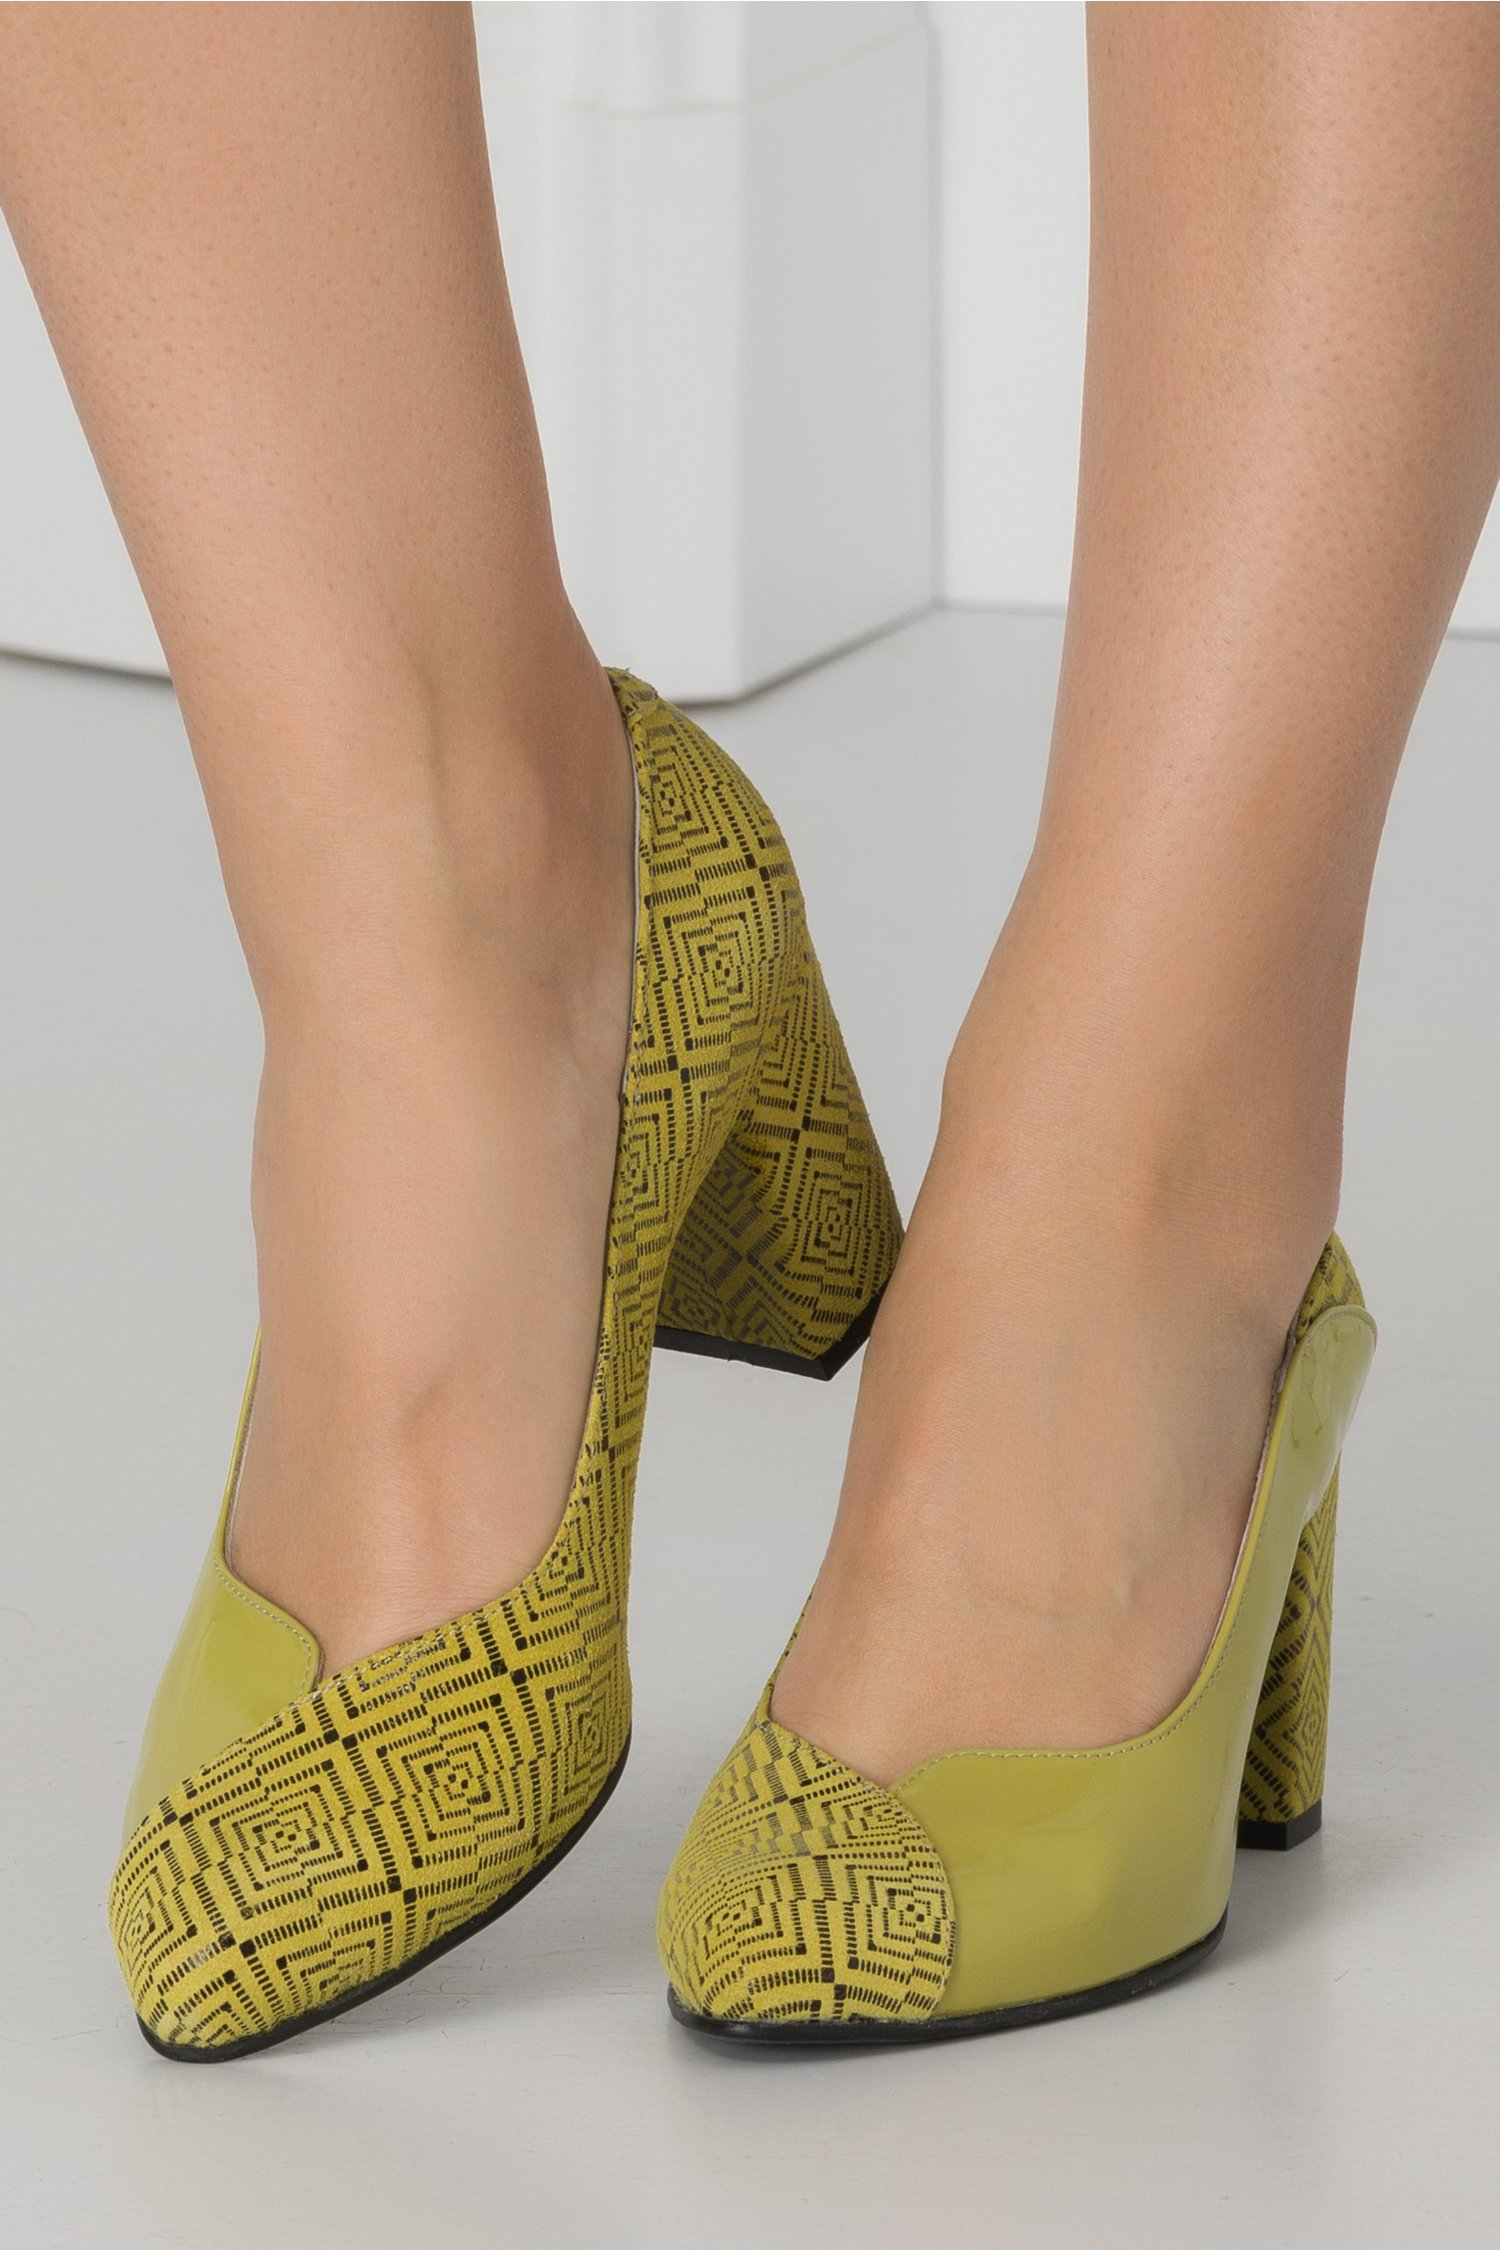 Pantofi lacuiti verde lime cu insertie din piele intoarsa imprimata lateral